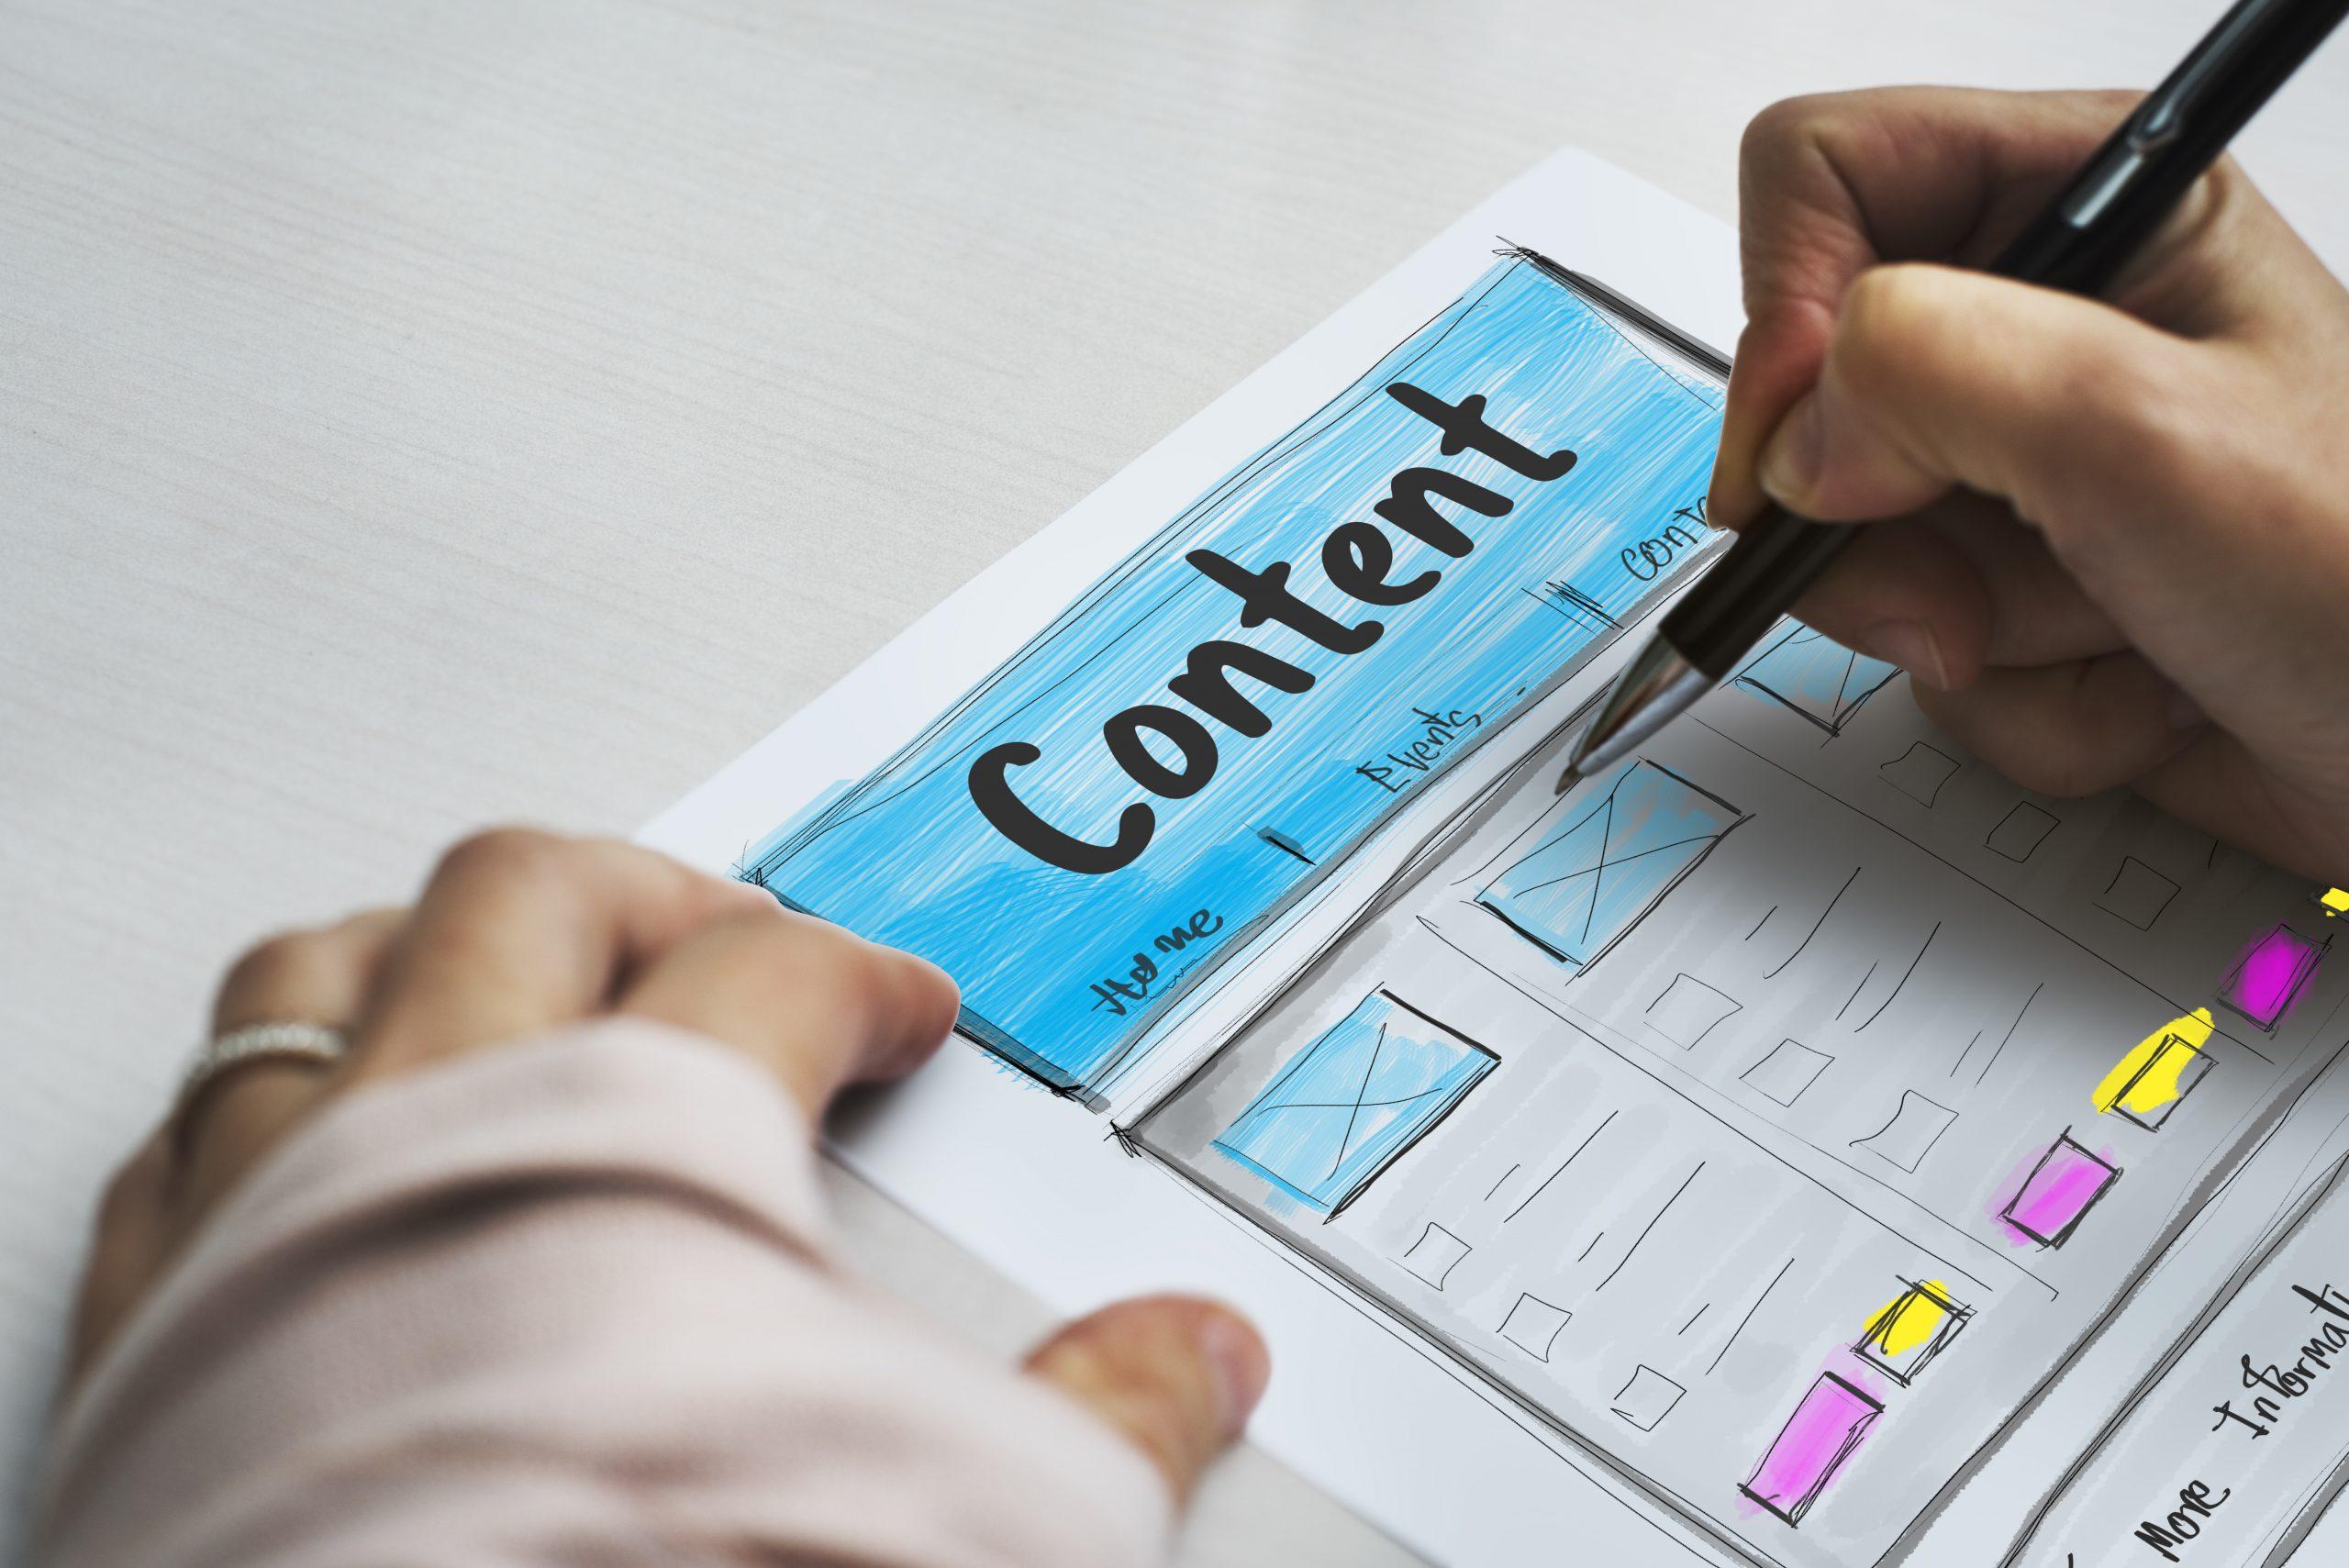 como adaptar contenido a las busquedas en internet